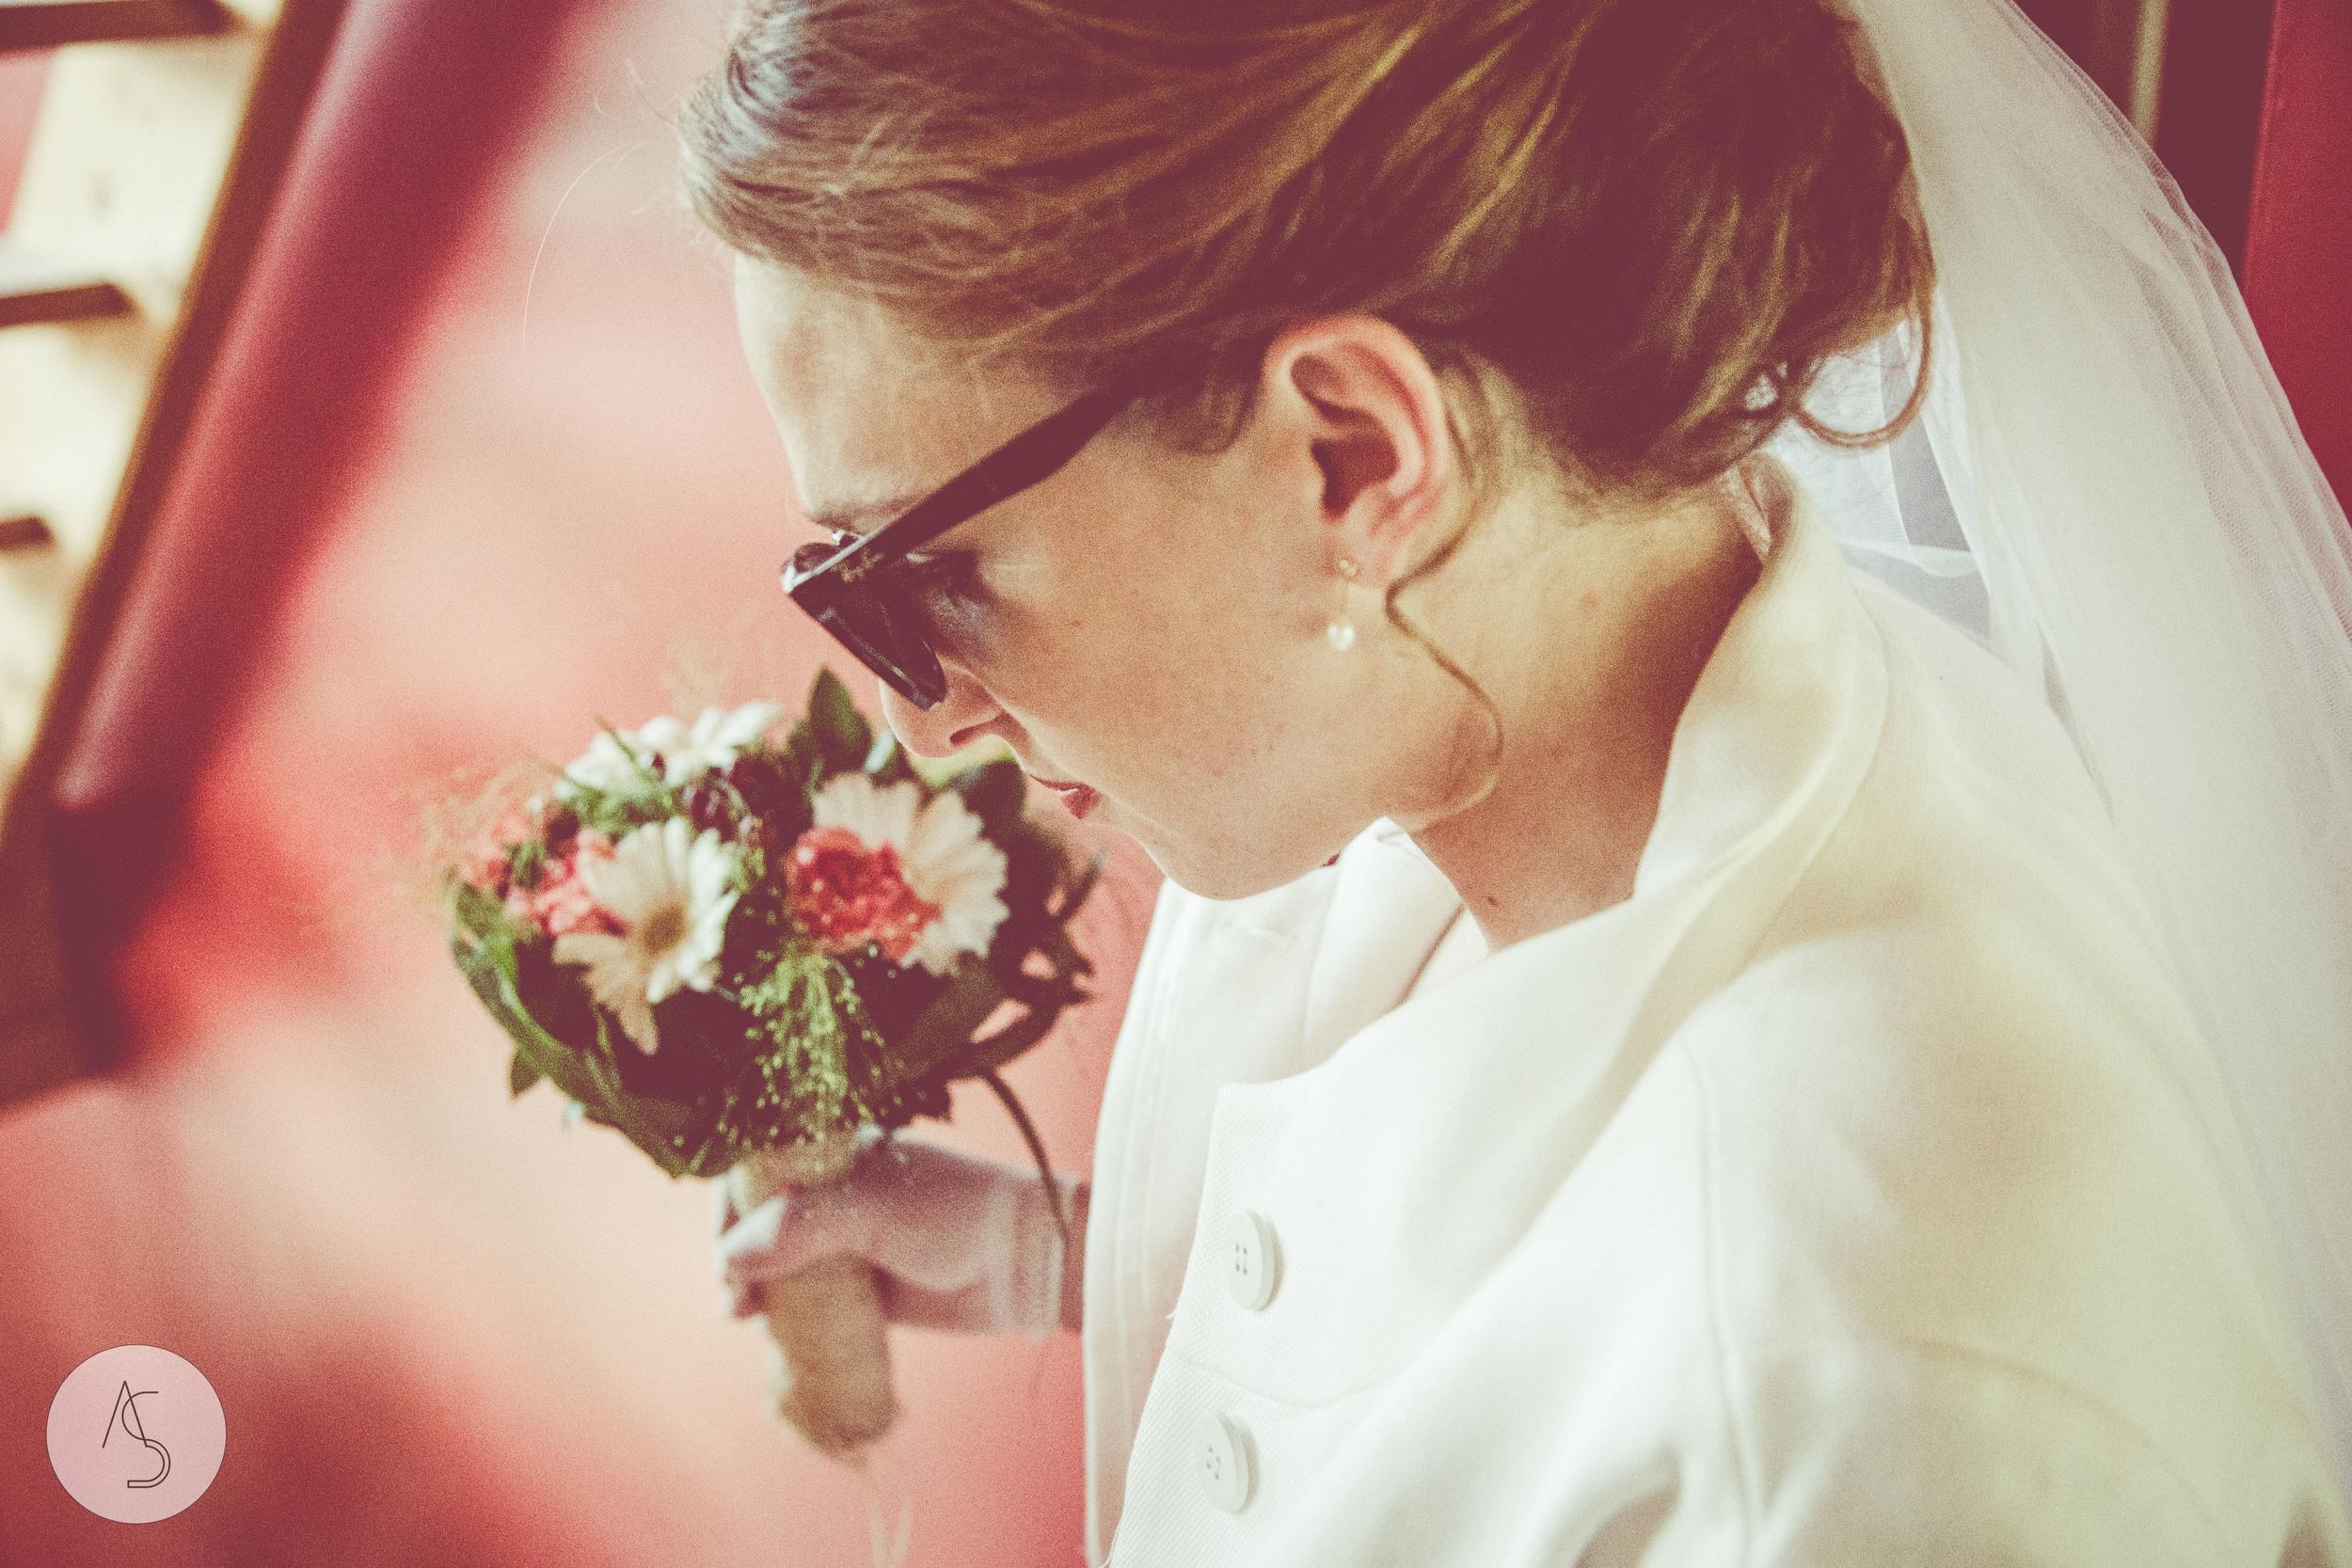 photographe mariage - Grenoble - Rhone Alpes - Adriana Salazar photo-58.jpg